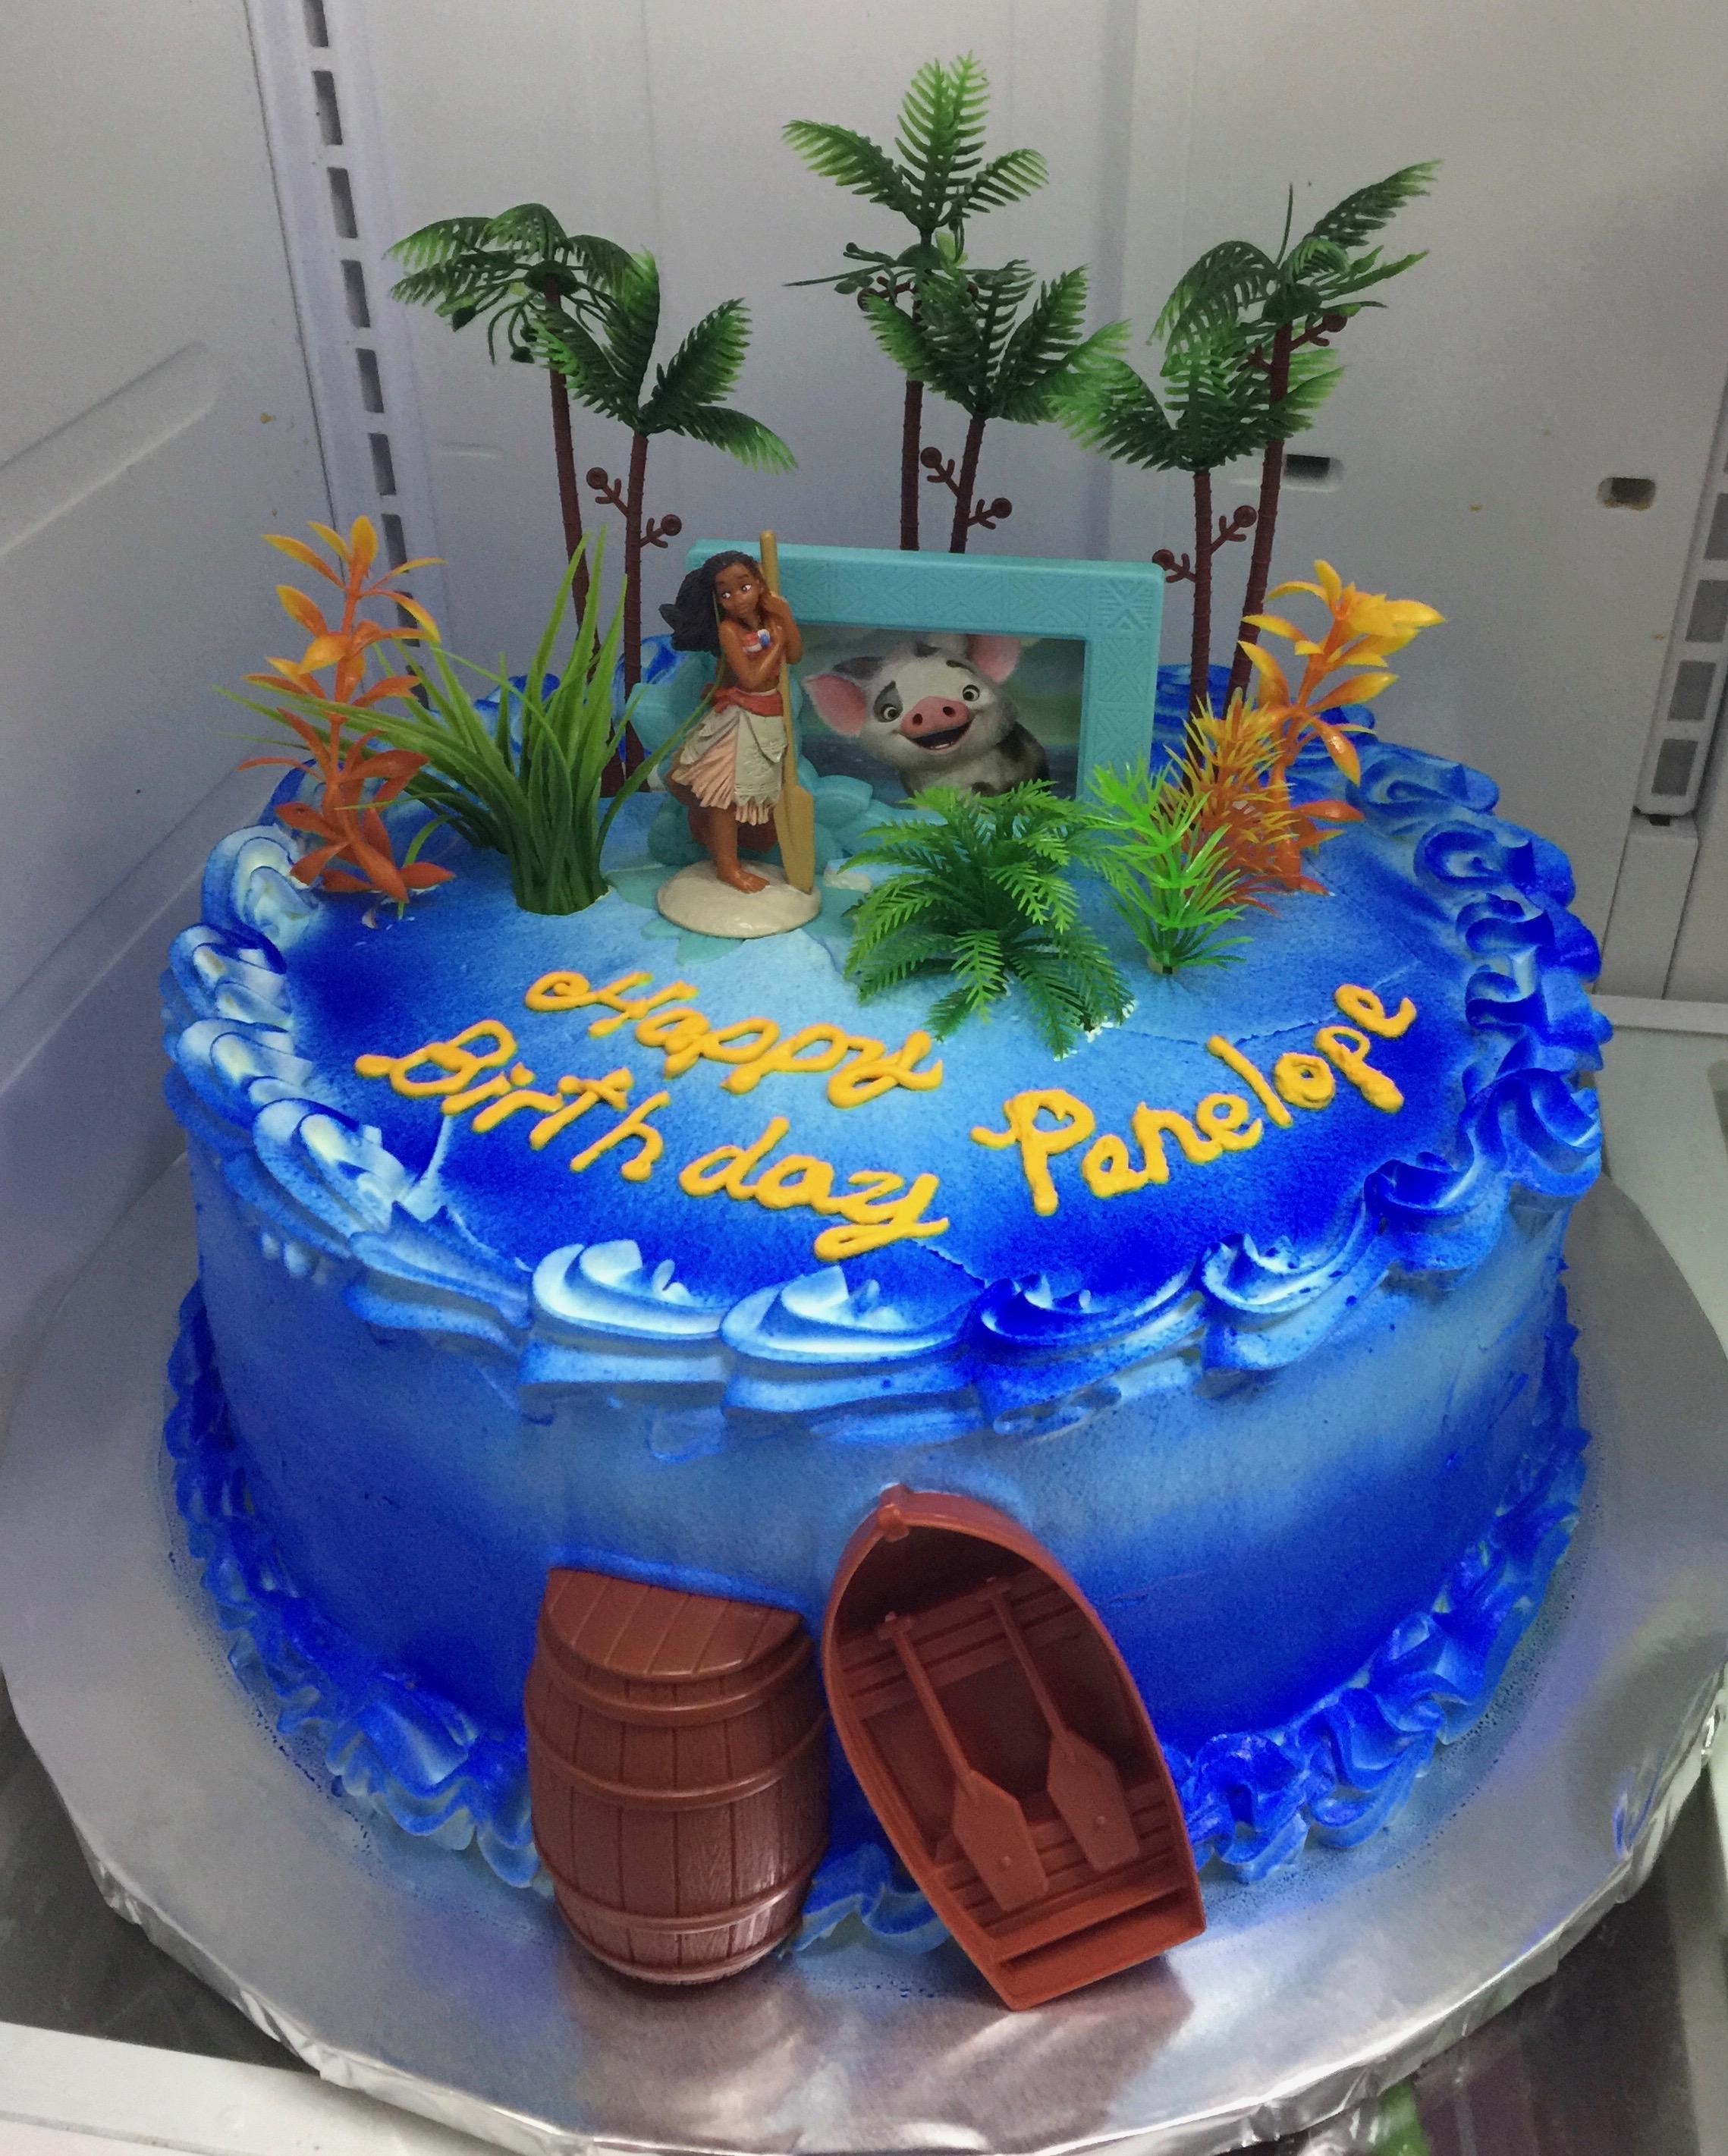 Astonishing Moana Blue Ocean Birthday Cake Sweet Tasty Bakery Personalised Birthday Cards Sponlily Jamesorg